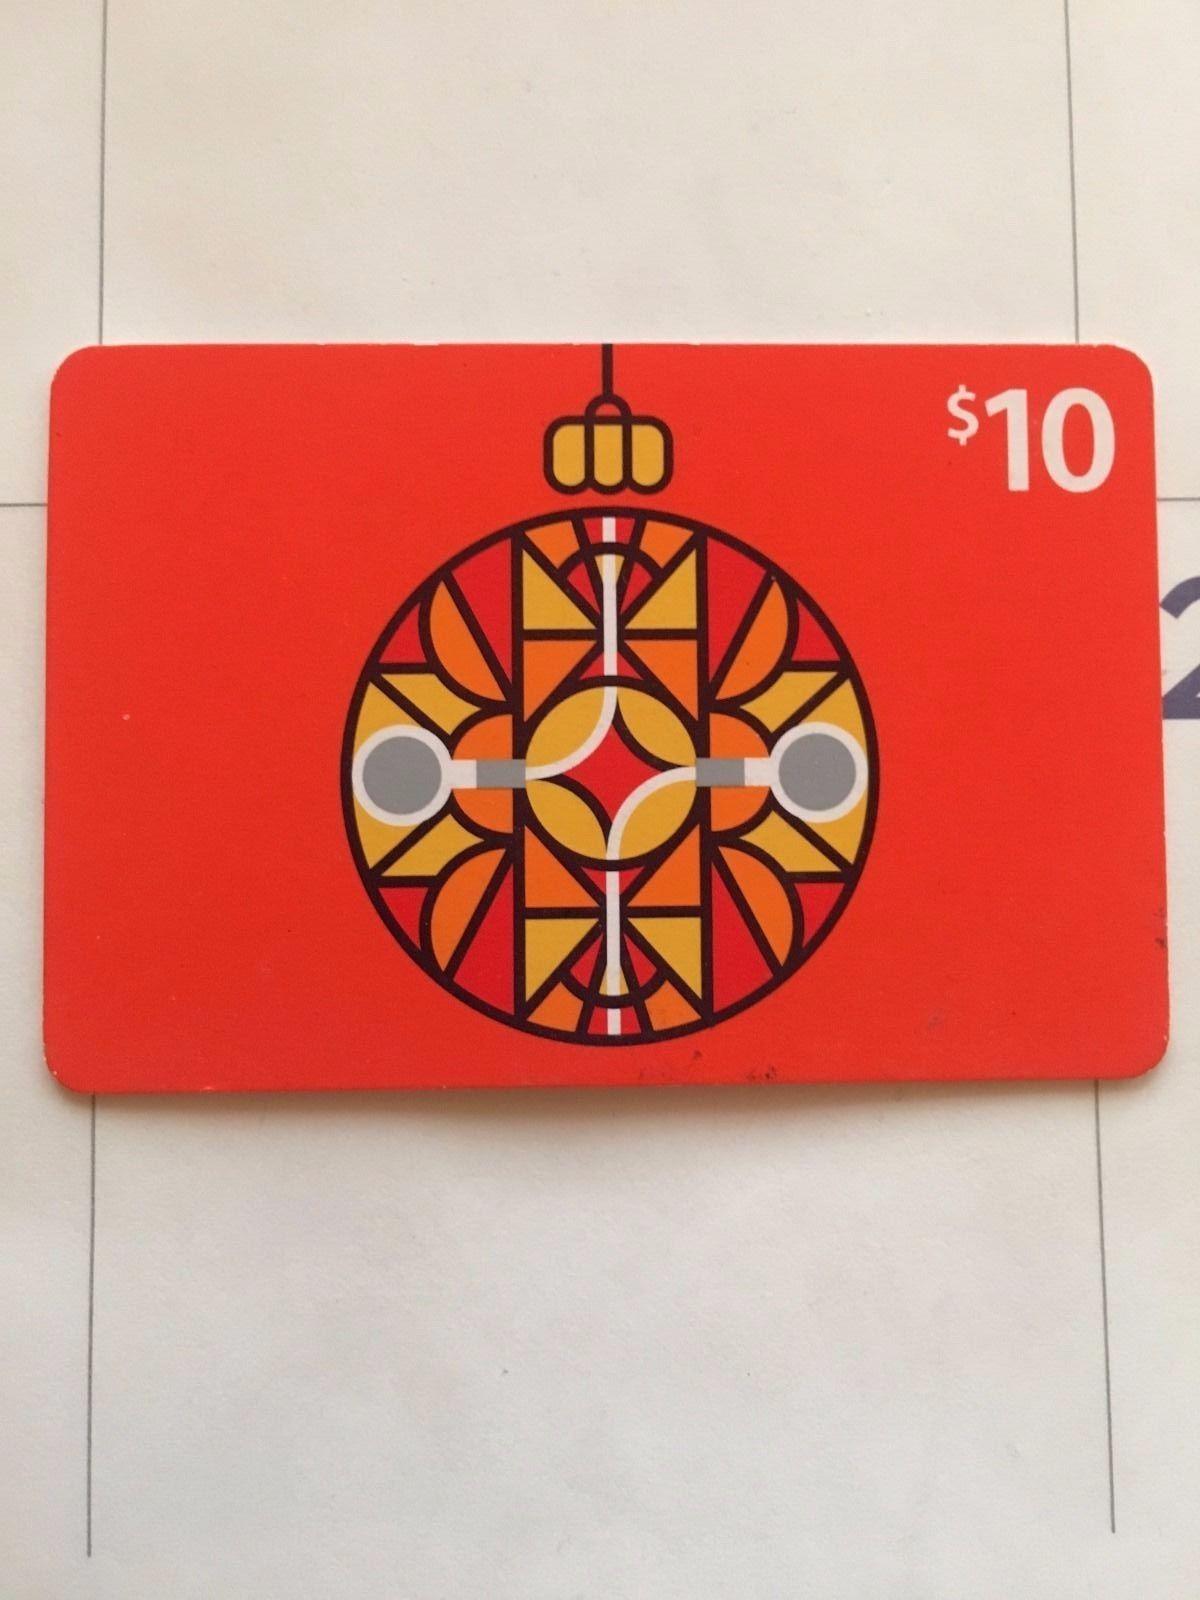 10 Apple Itunes Gift Card Music Mp3 Http Searchpromocodes Club 10 Apple Itunes Gift Card Music Mp3 Itunes Gift Cards Gift Card Gifts